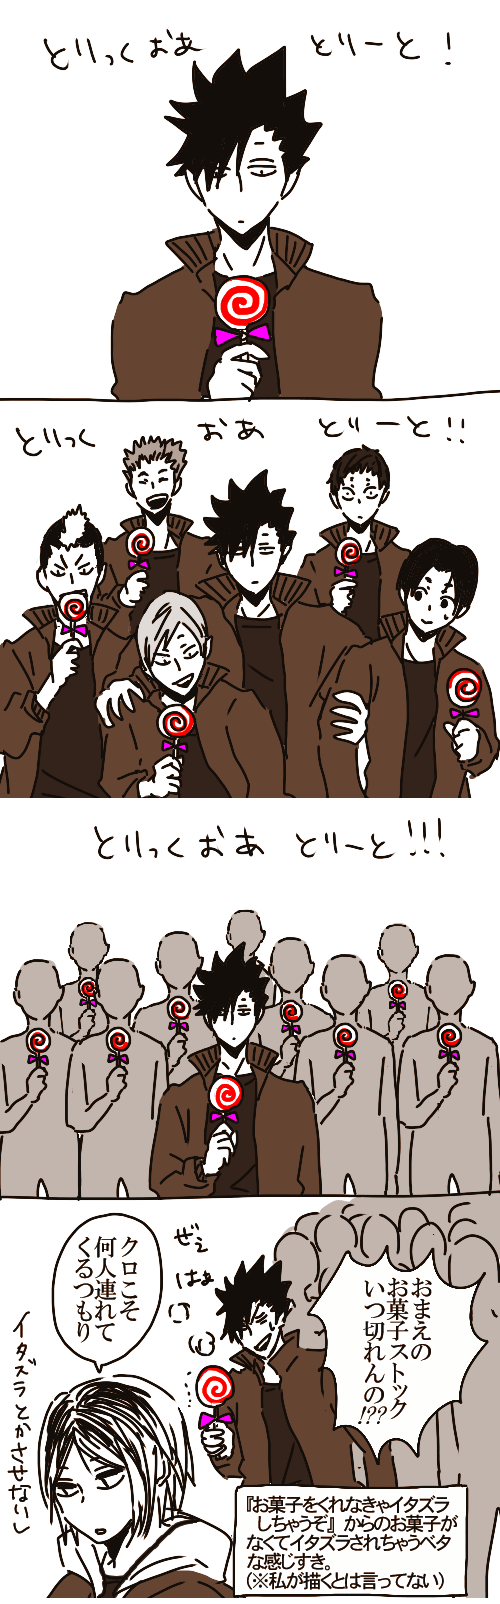 Hq音駒4人の中身がシャッフルする話他akiraの漫画 Pixiv